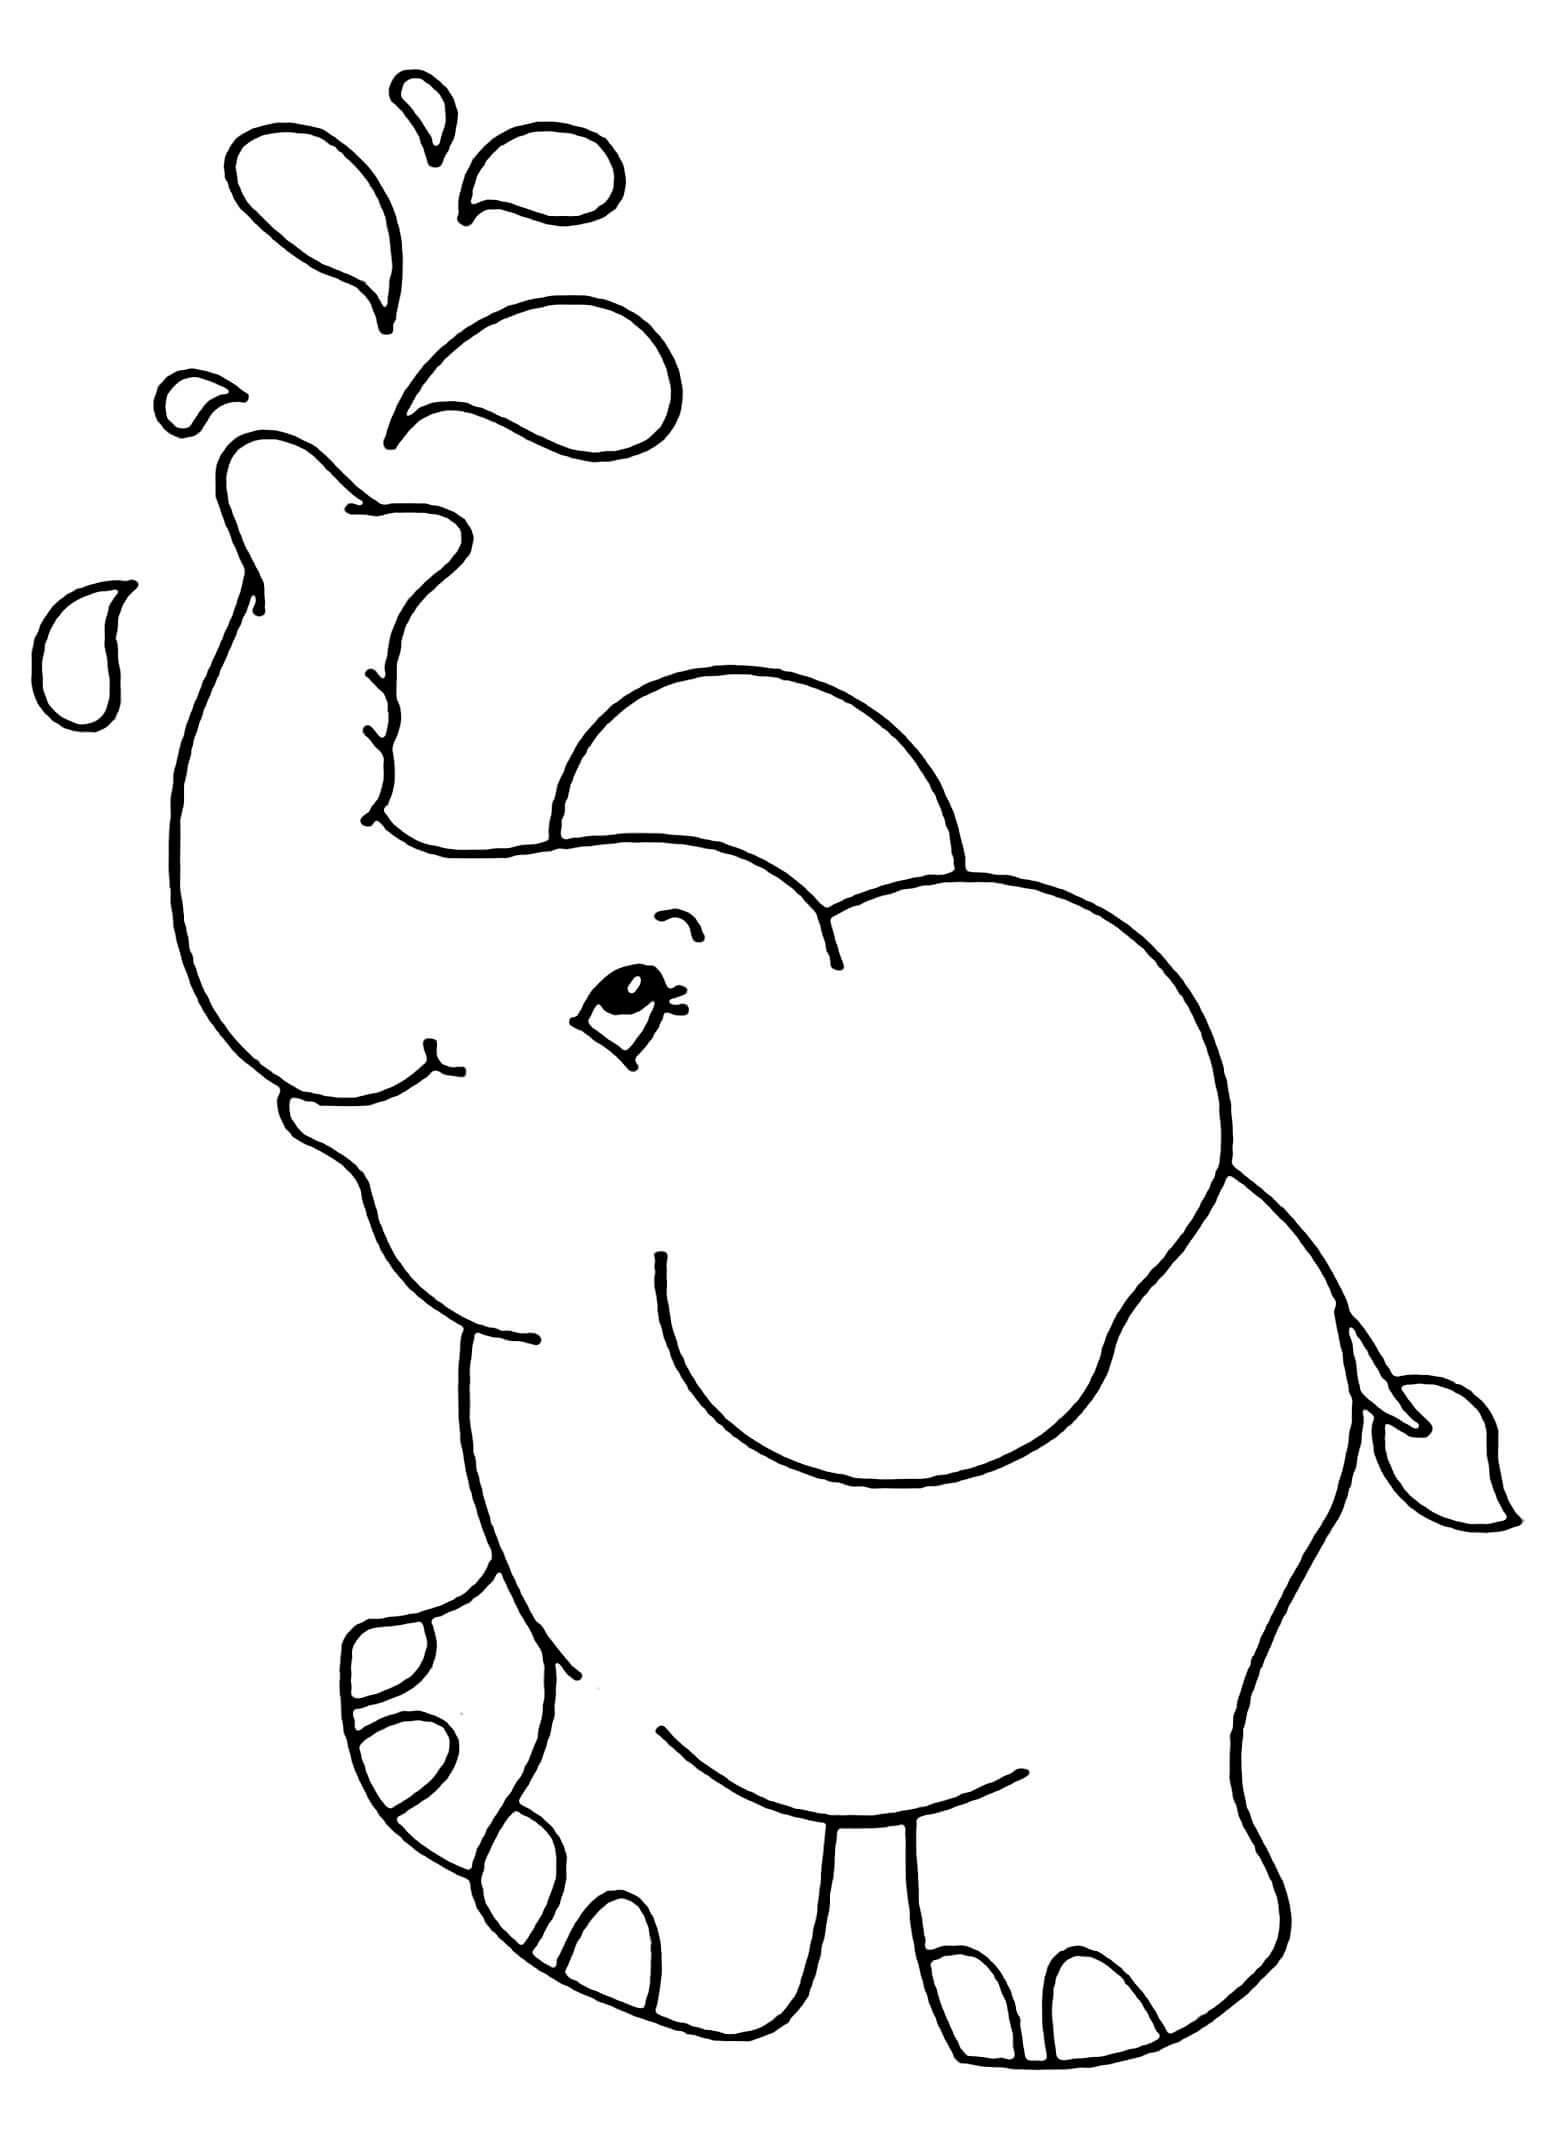 Desenhos de Elefante Simples para colorir